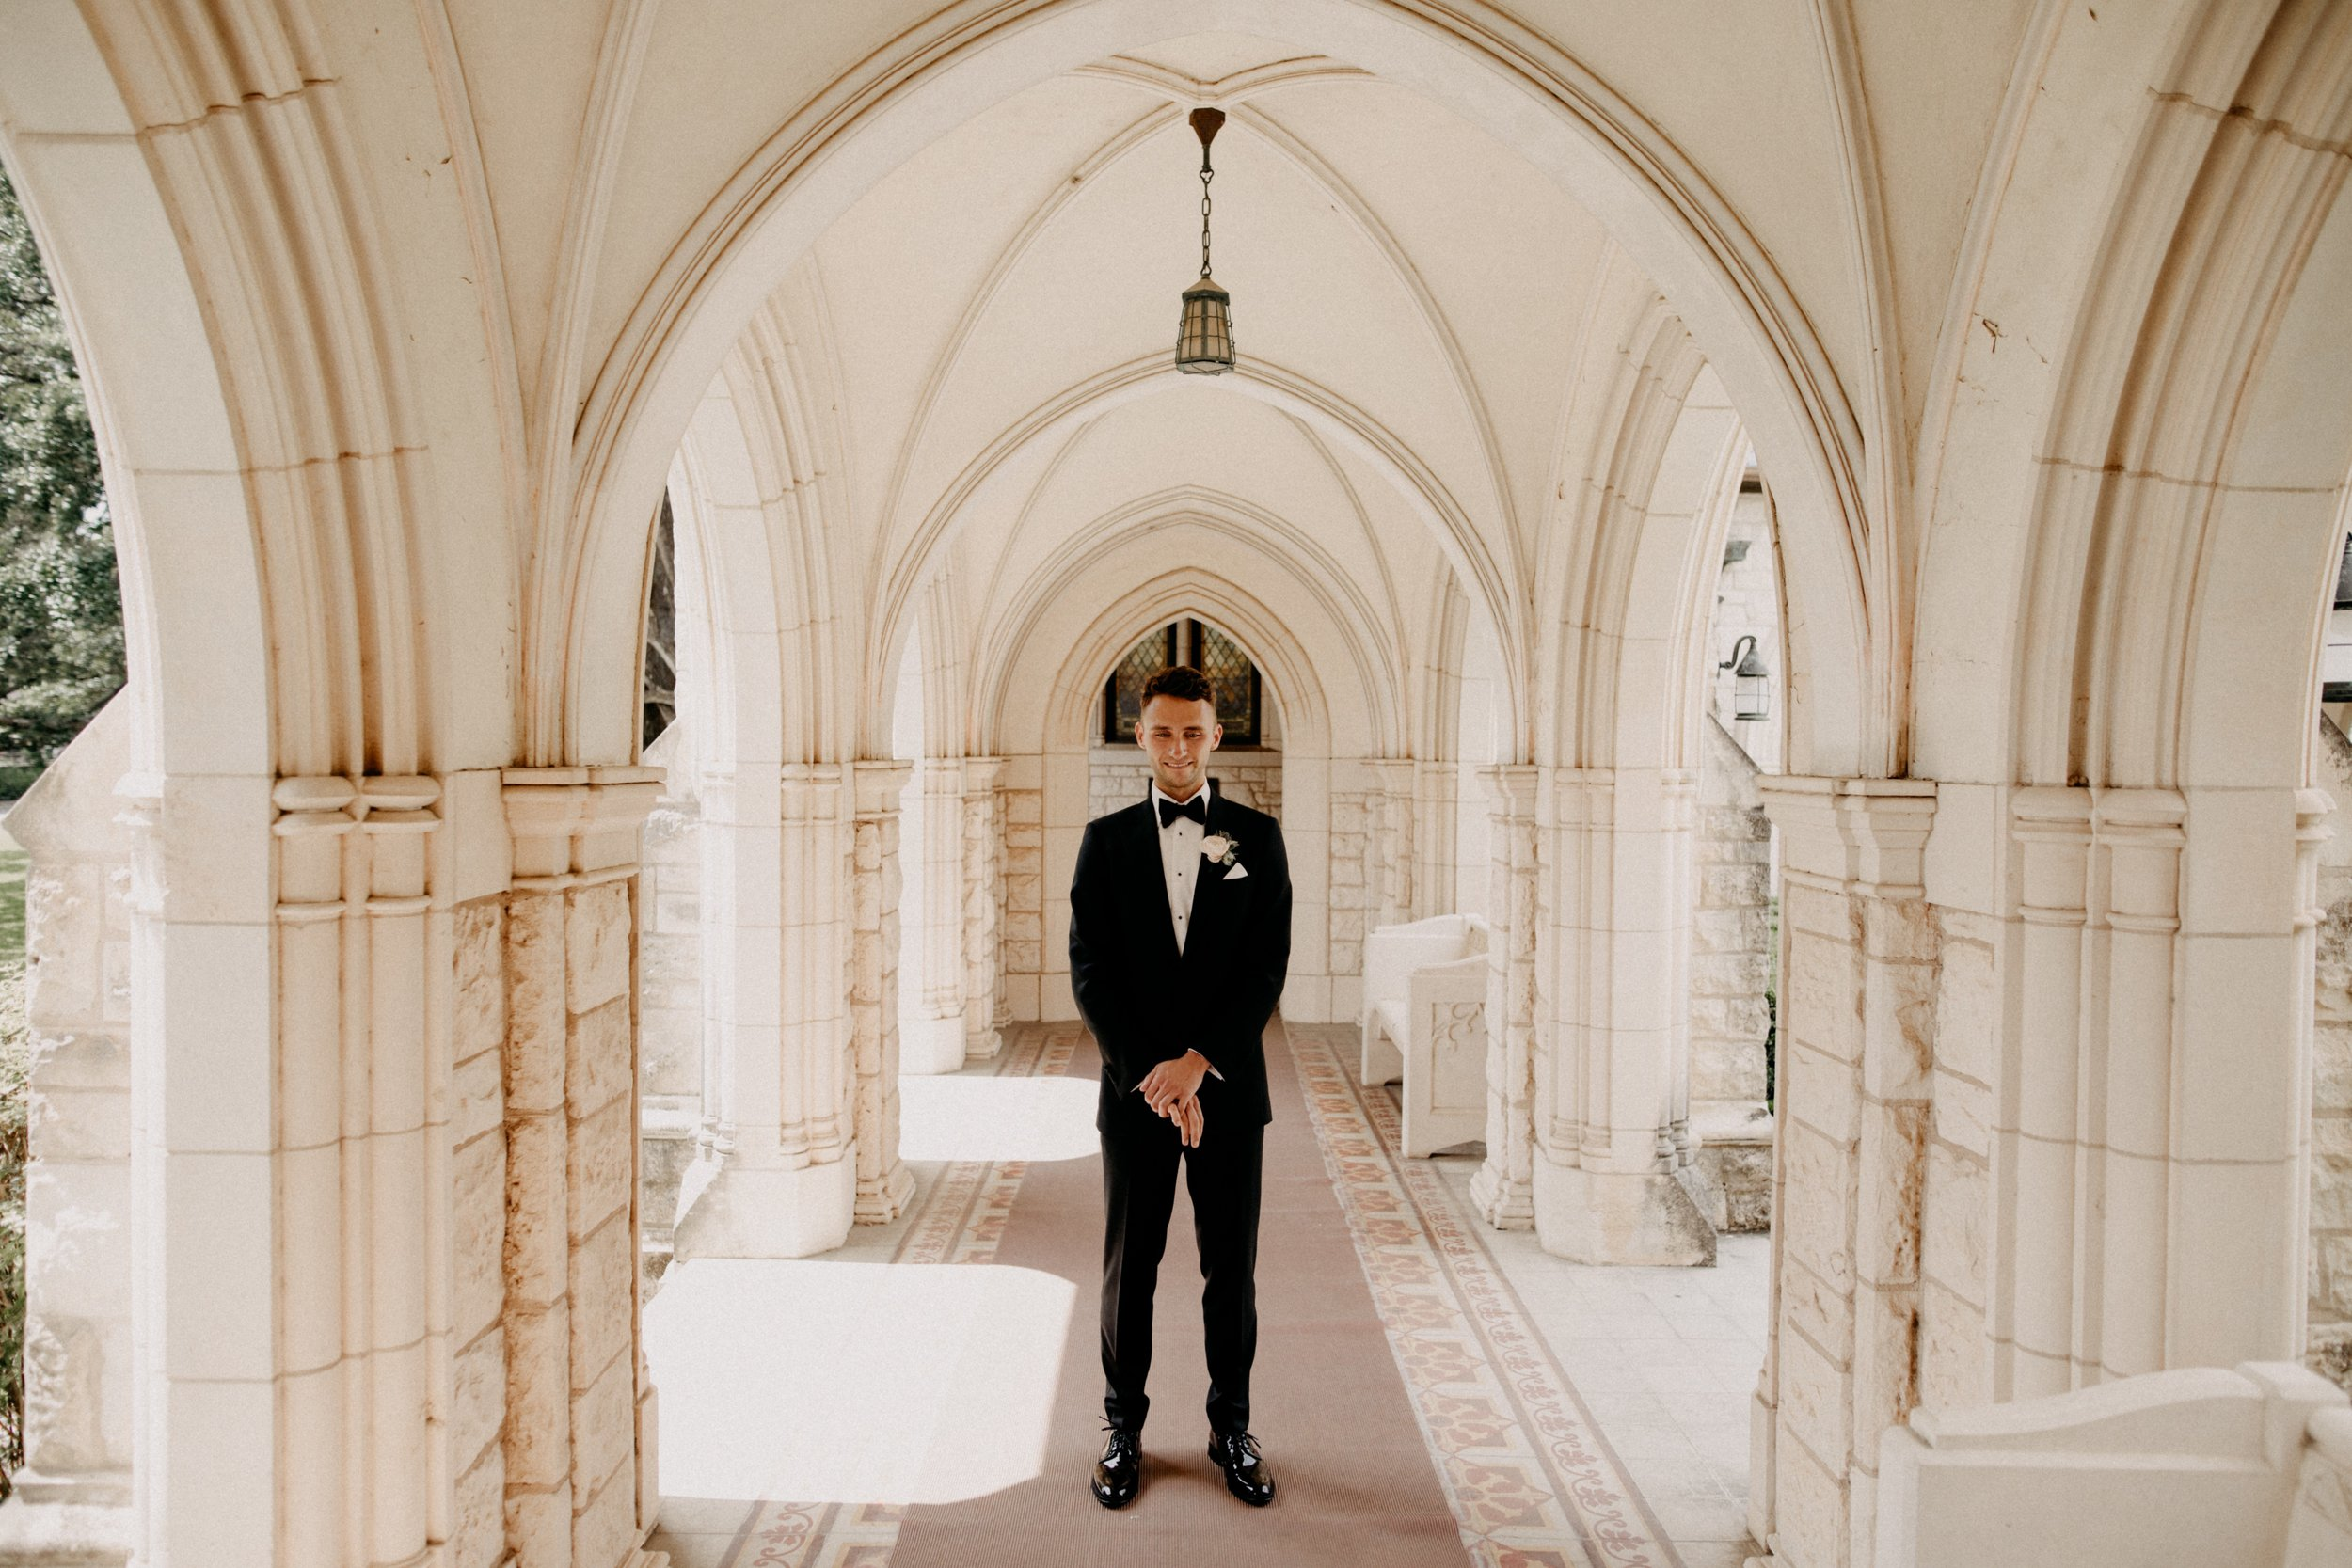 st-anthony-hotel-wedding-photography-10043san-antonio.JPG